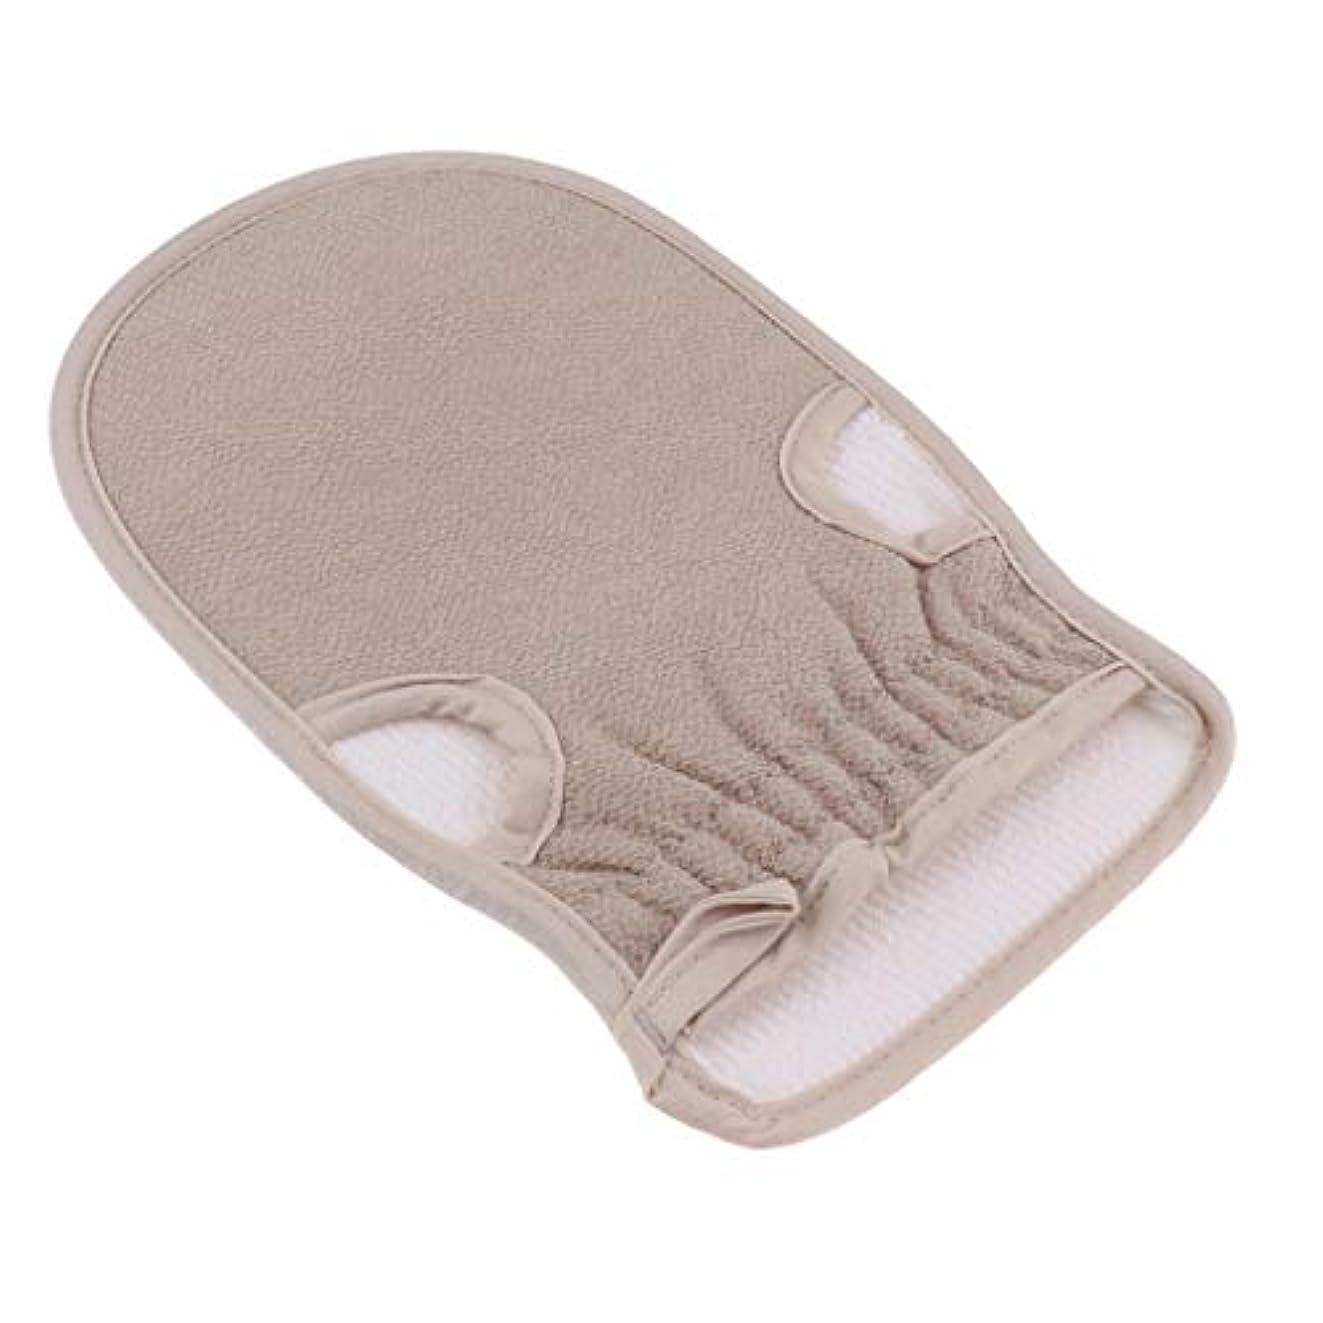 CUTICATE 浴用手袋 ボディタオル 垢すり手袋 バスグッズ 両面デザイン 毛穴清潔 角質除去 男女兼用 全4色 - グレー